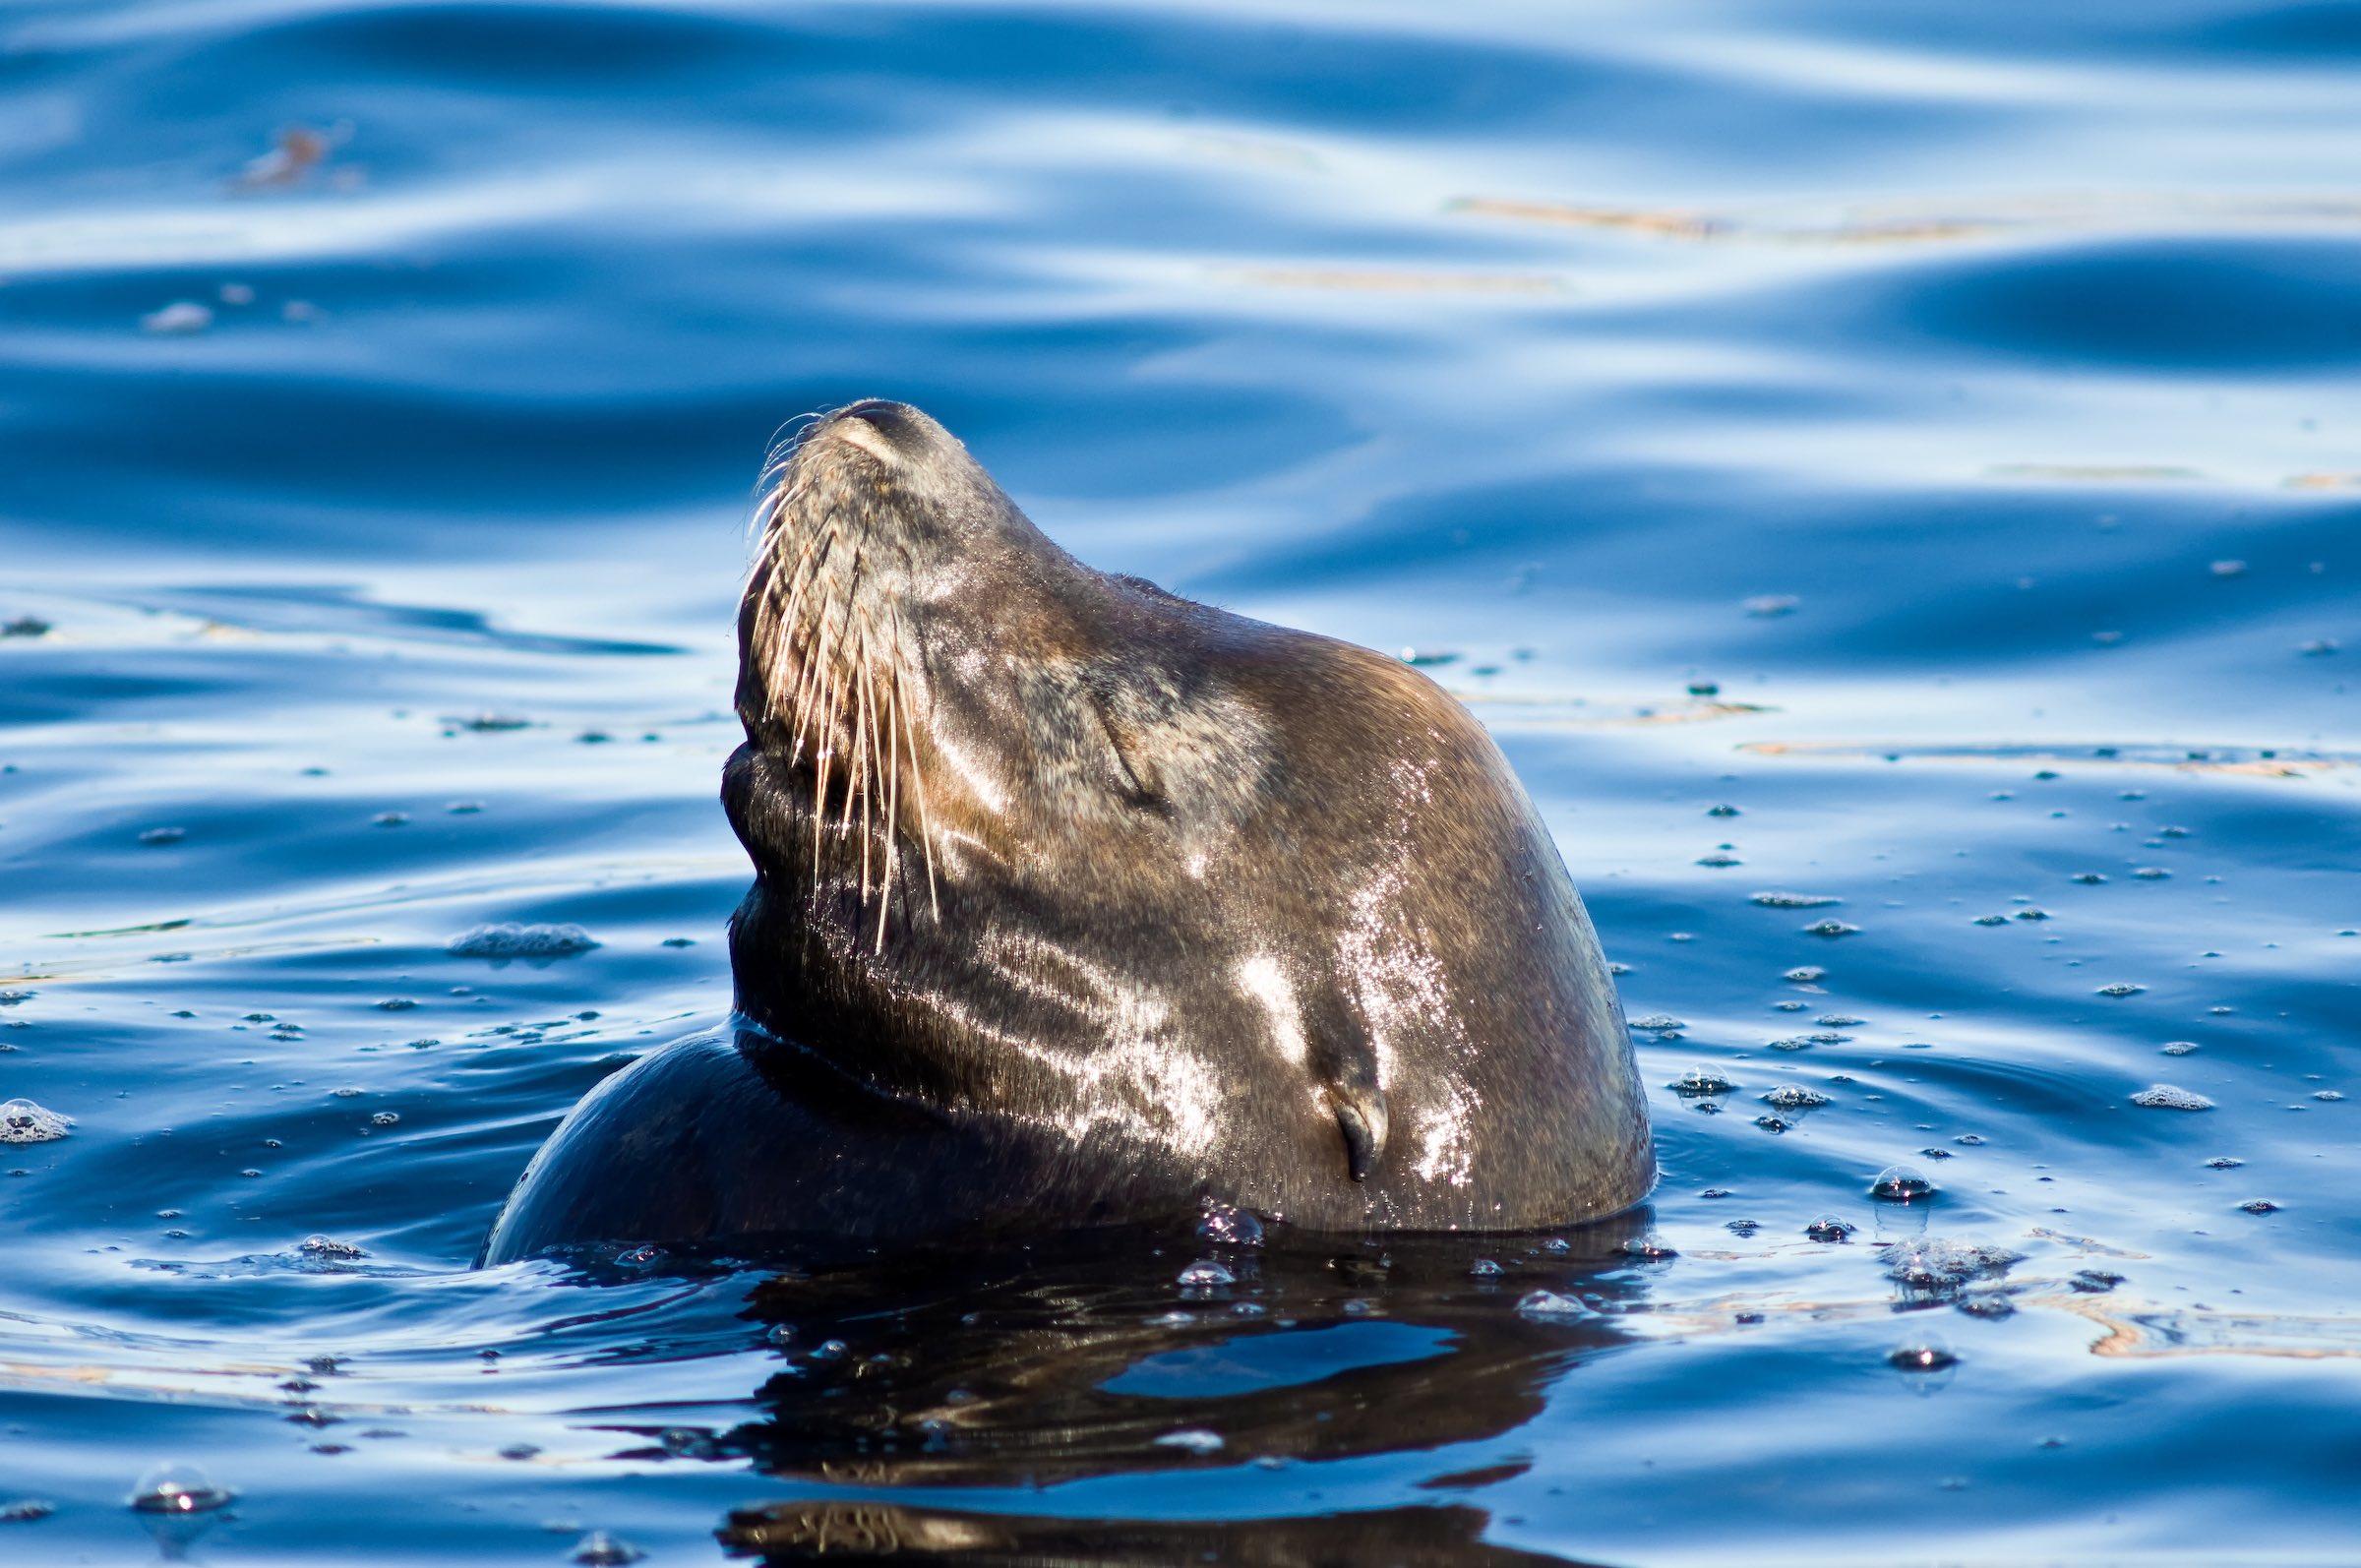 CALIFORNIA SEA LION. © GIVEN PHOTOGRAPHY 2018